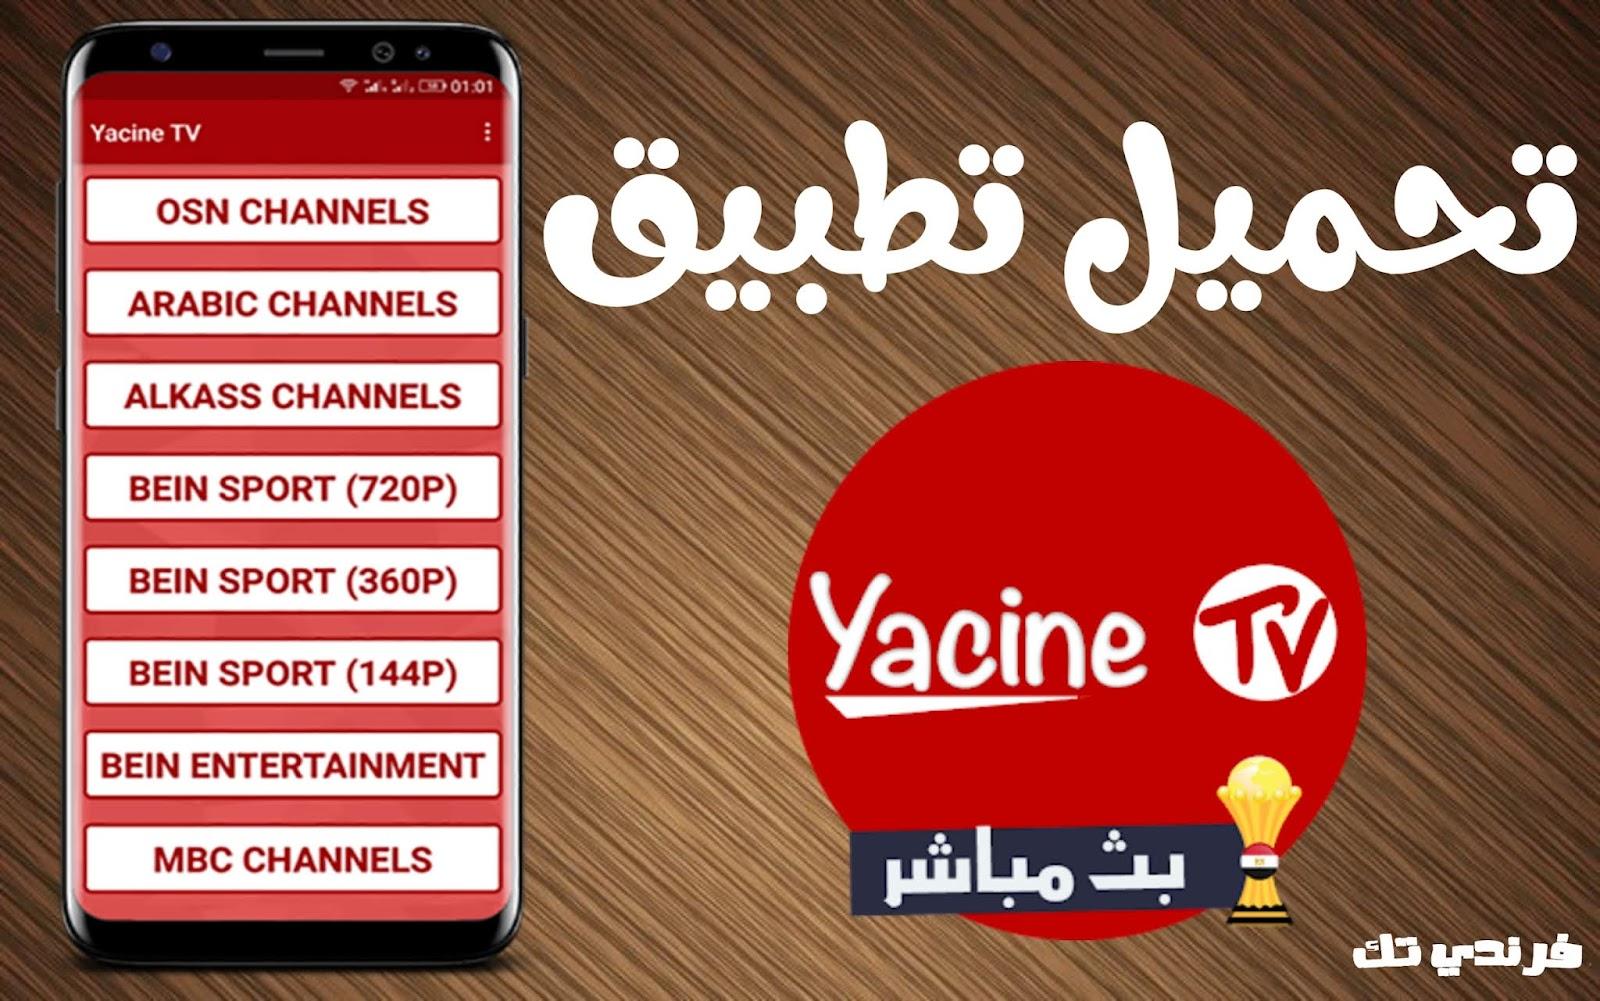 تحميل تطبيق ياسين تيفي Yacine Tv 2022 برابط مباشر